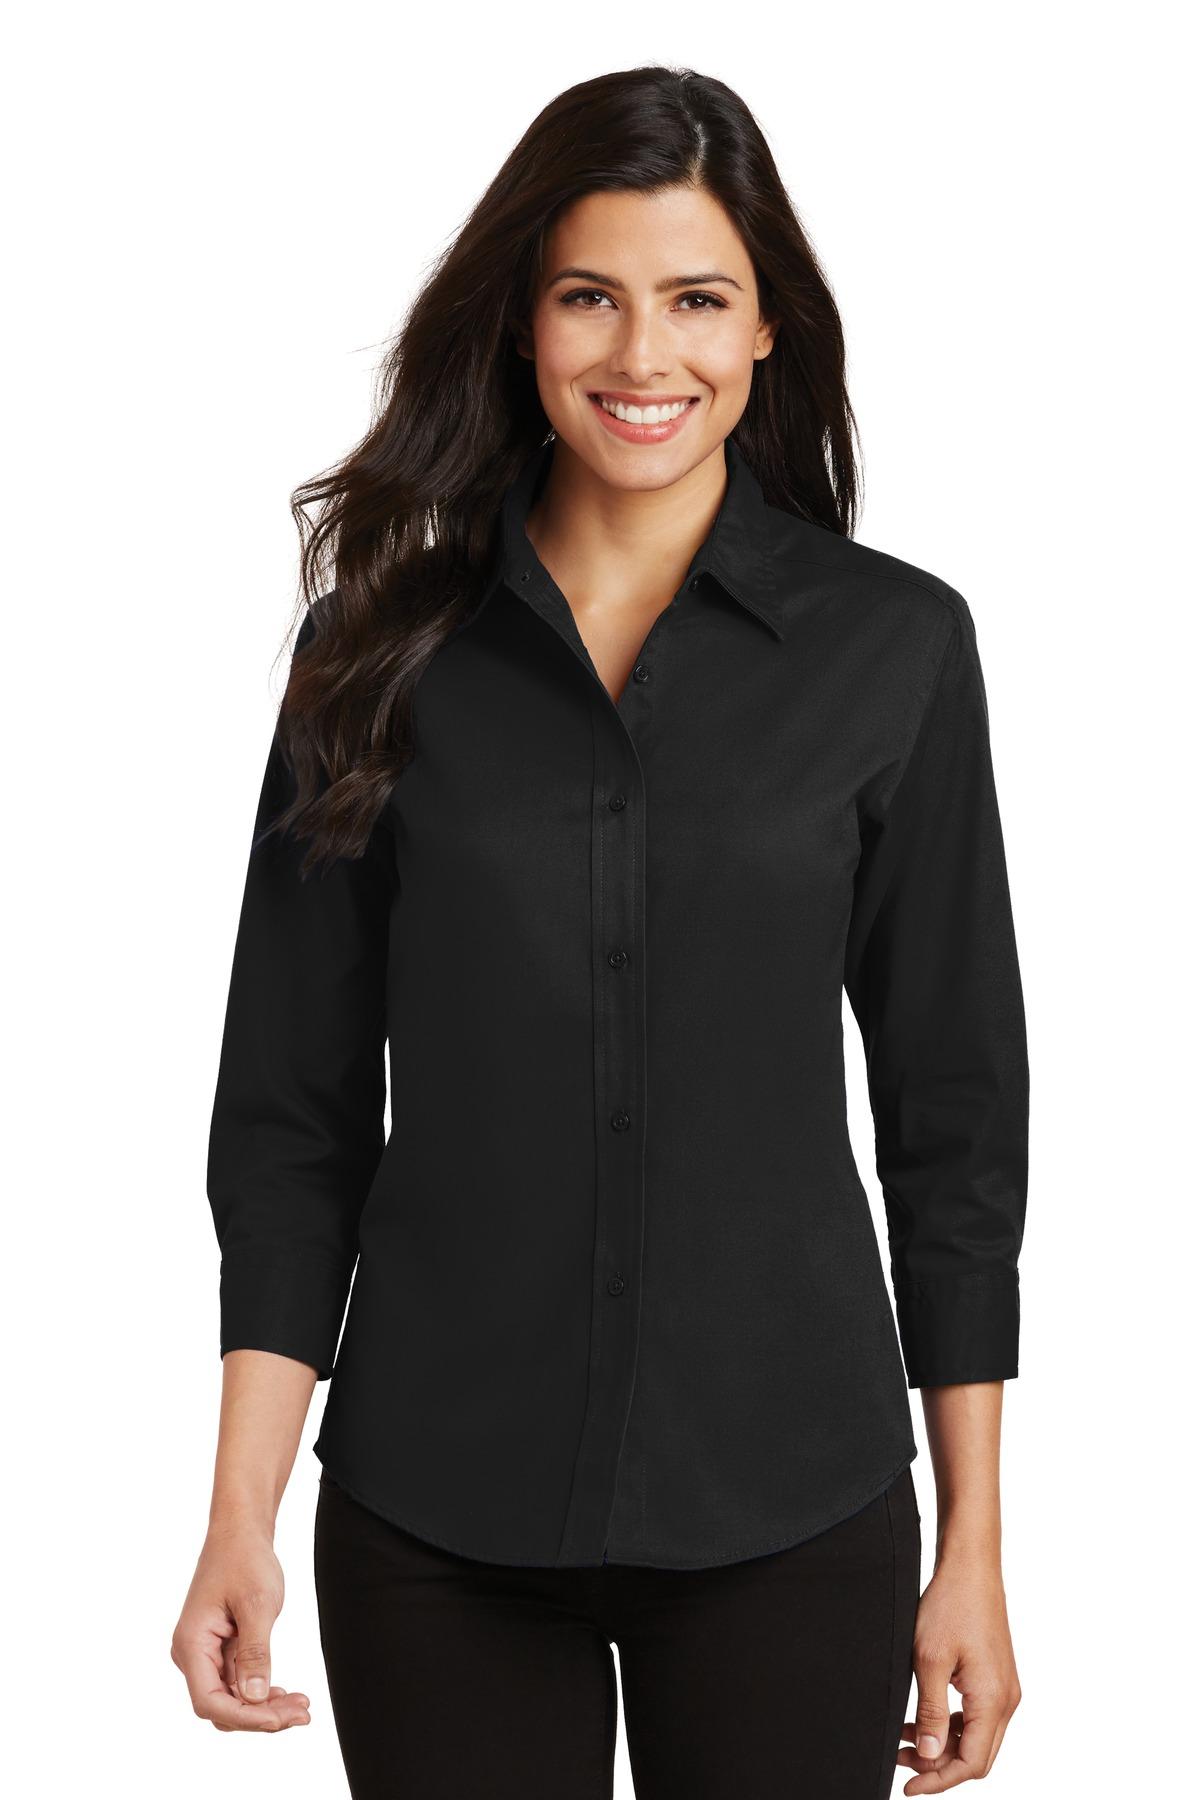 Port Authority® Ladies 3/4-Sleeve Easy Care Shirt.-Port Authority